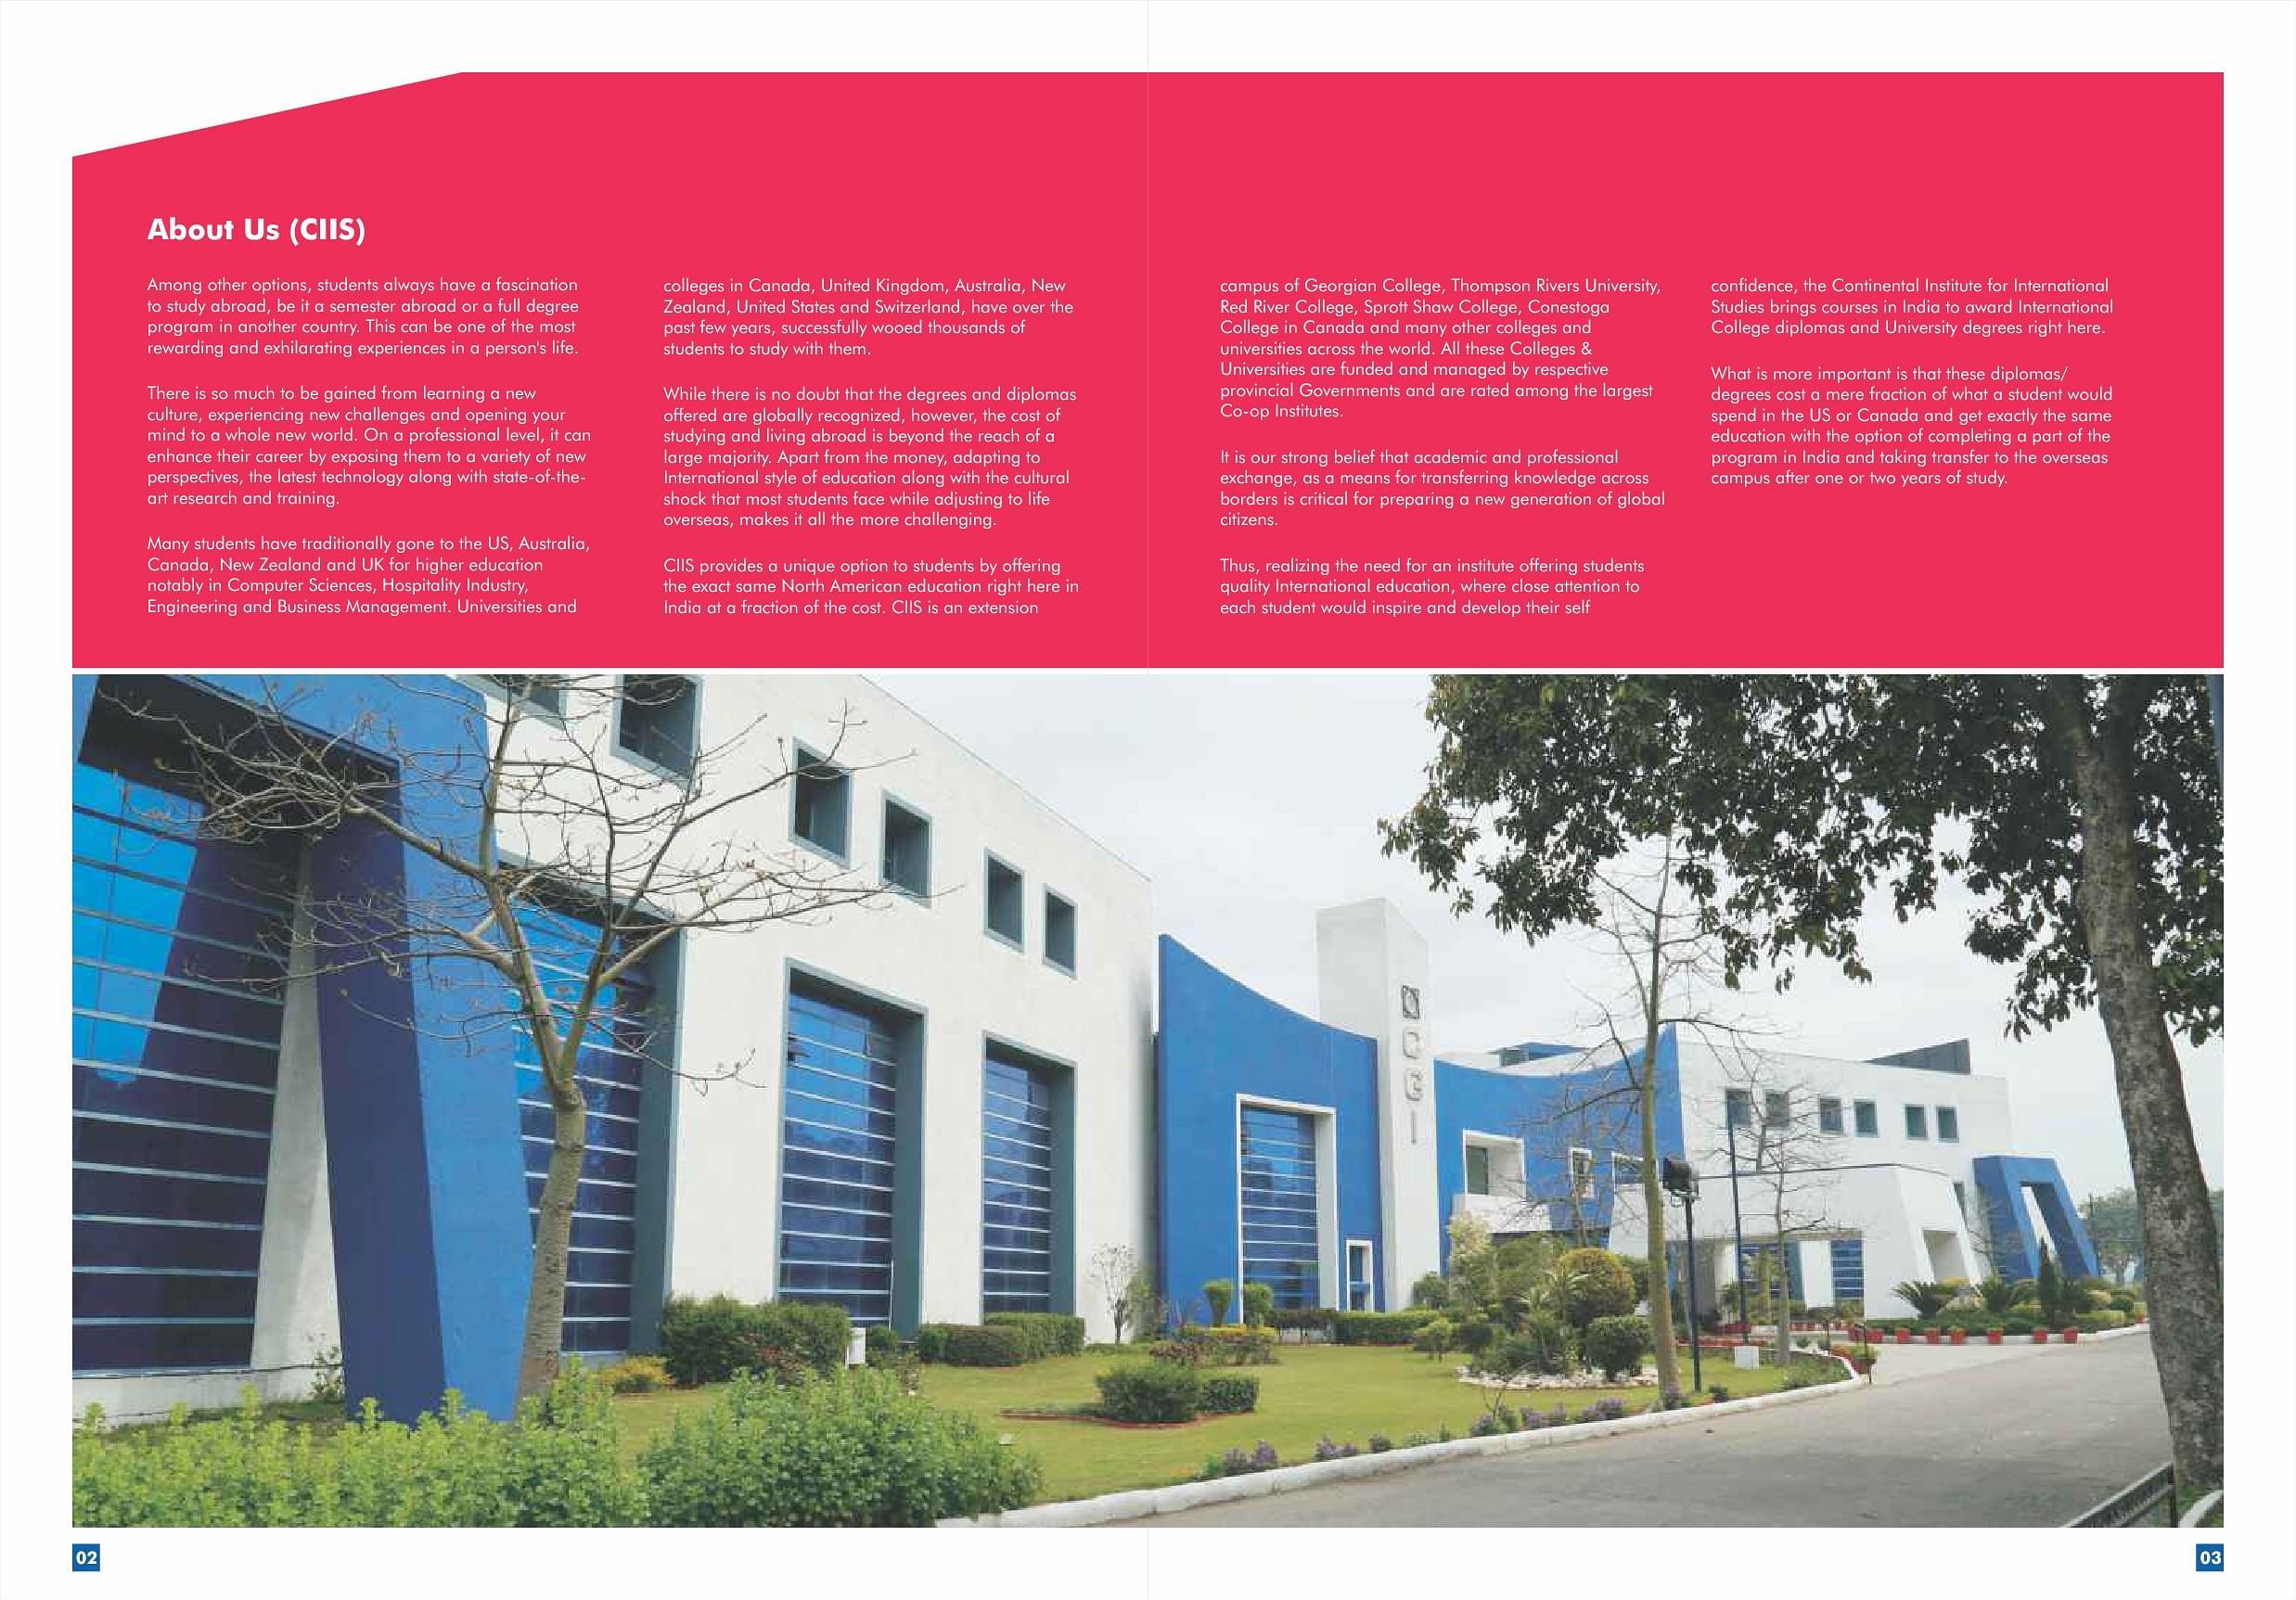 Continental Institute Of International Studies Fatehgarh Sahib